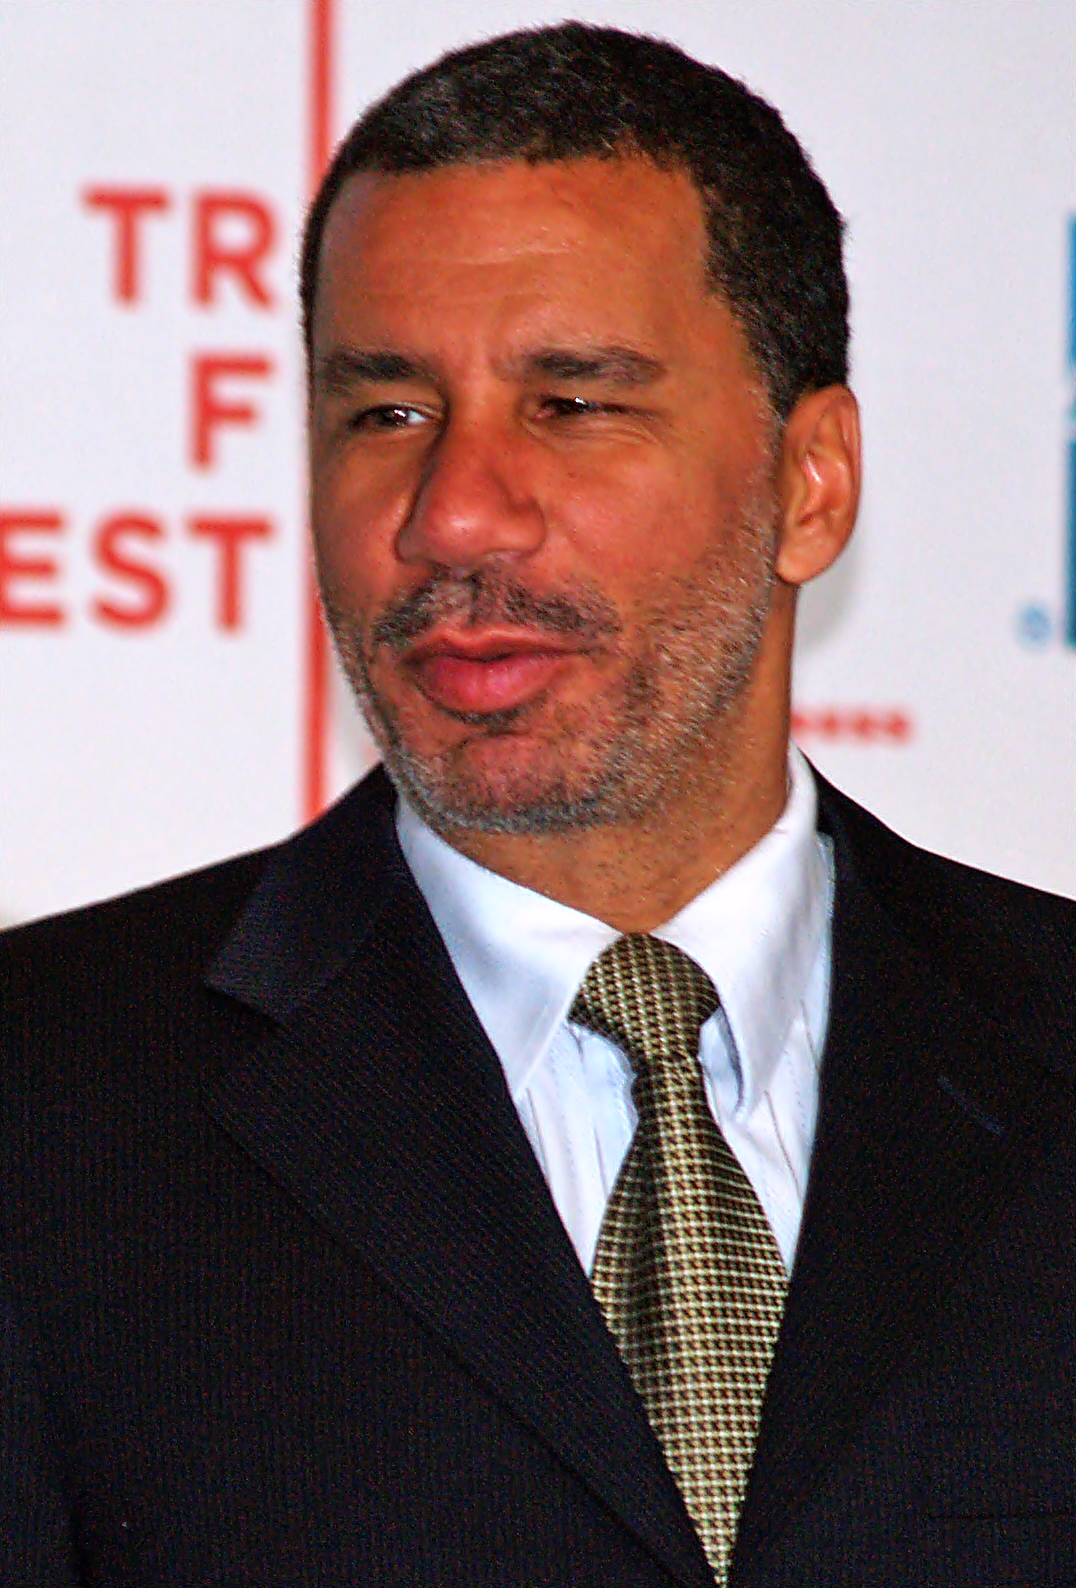 https://i2.wp.com/upload.wikimedia.org/wikipedia/commons/8/8d/David_Paterson_2_by_David_Shankbone.jpg